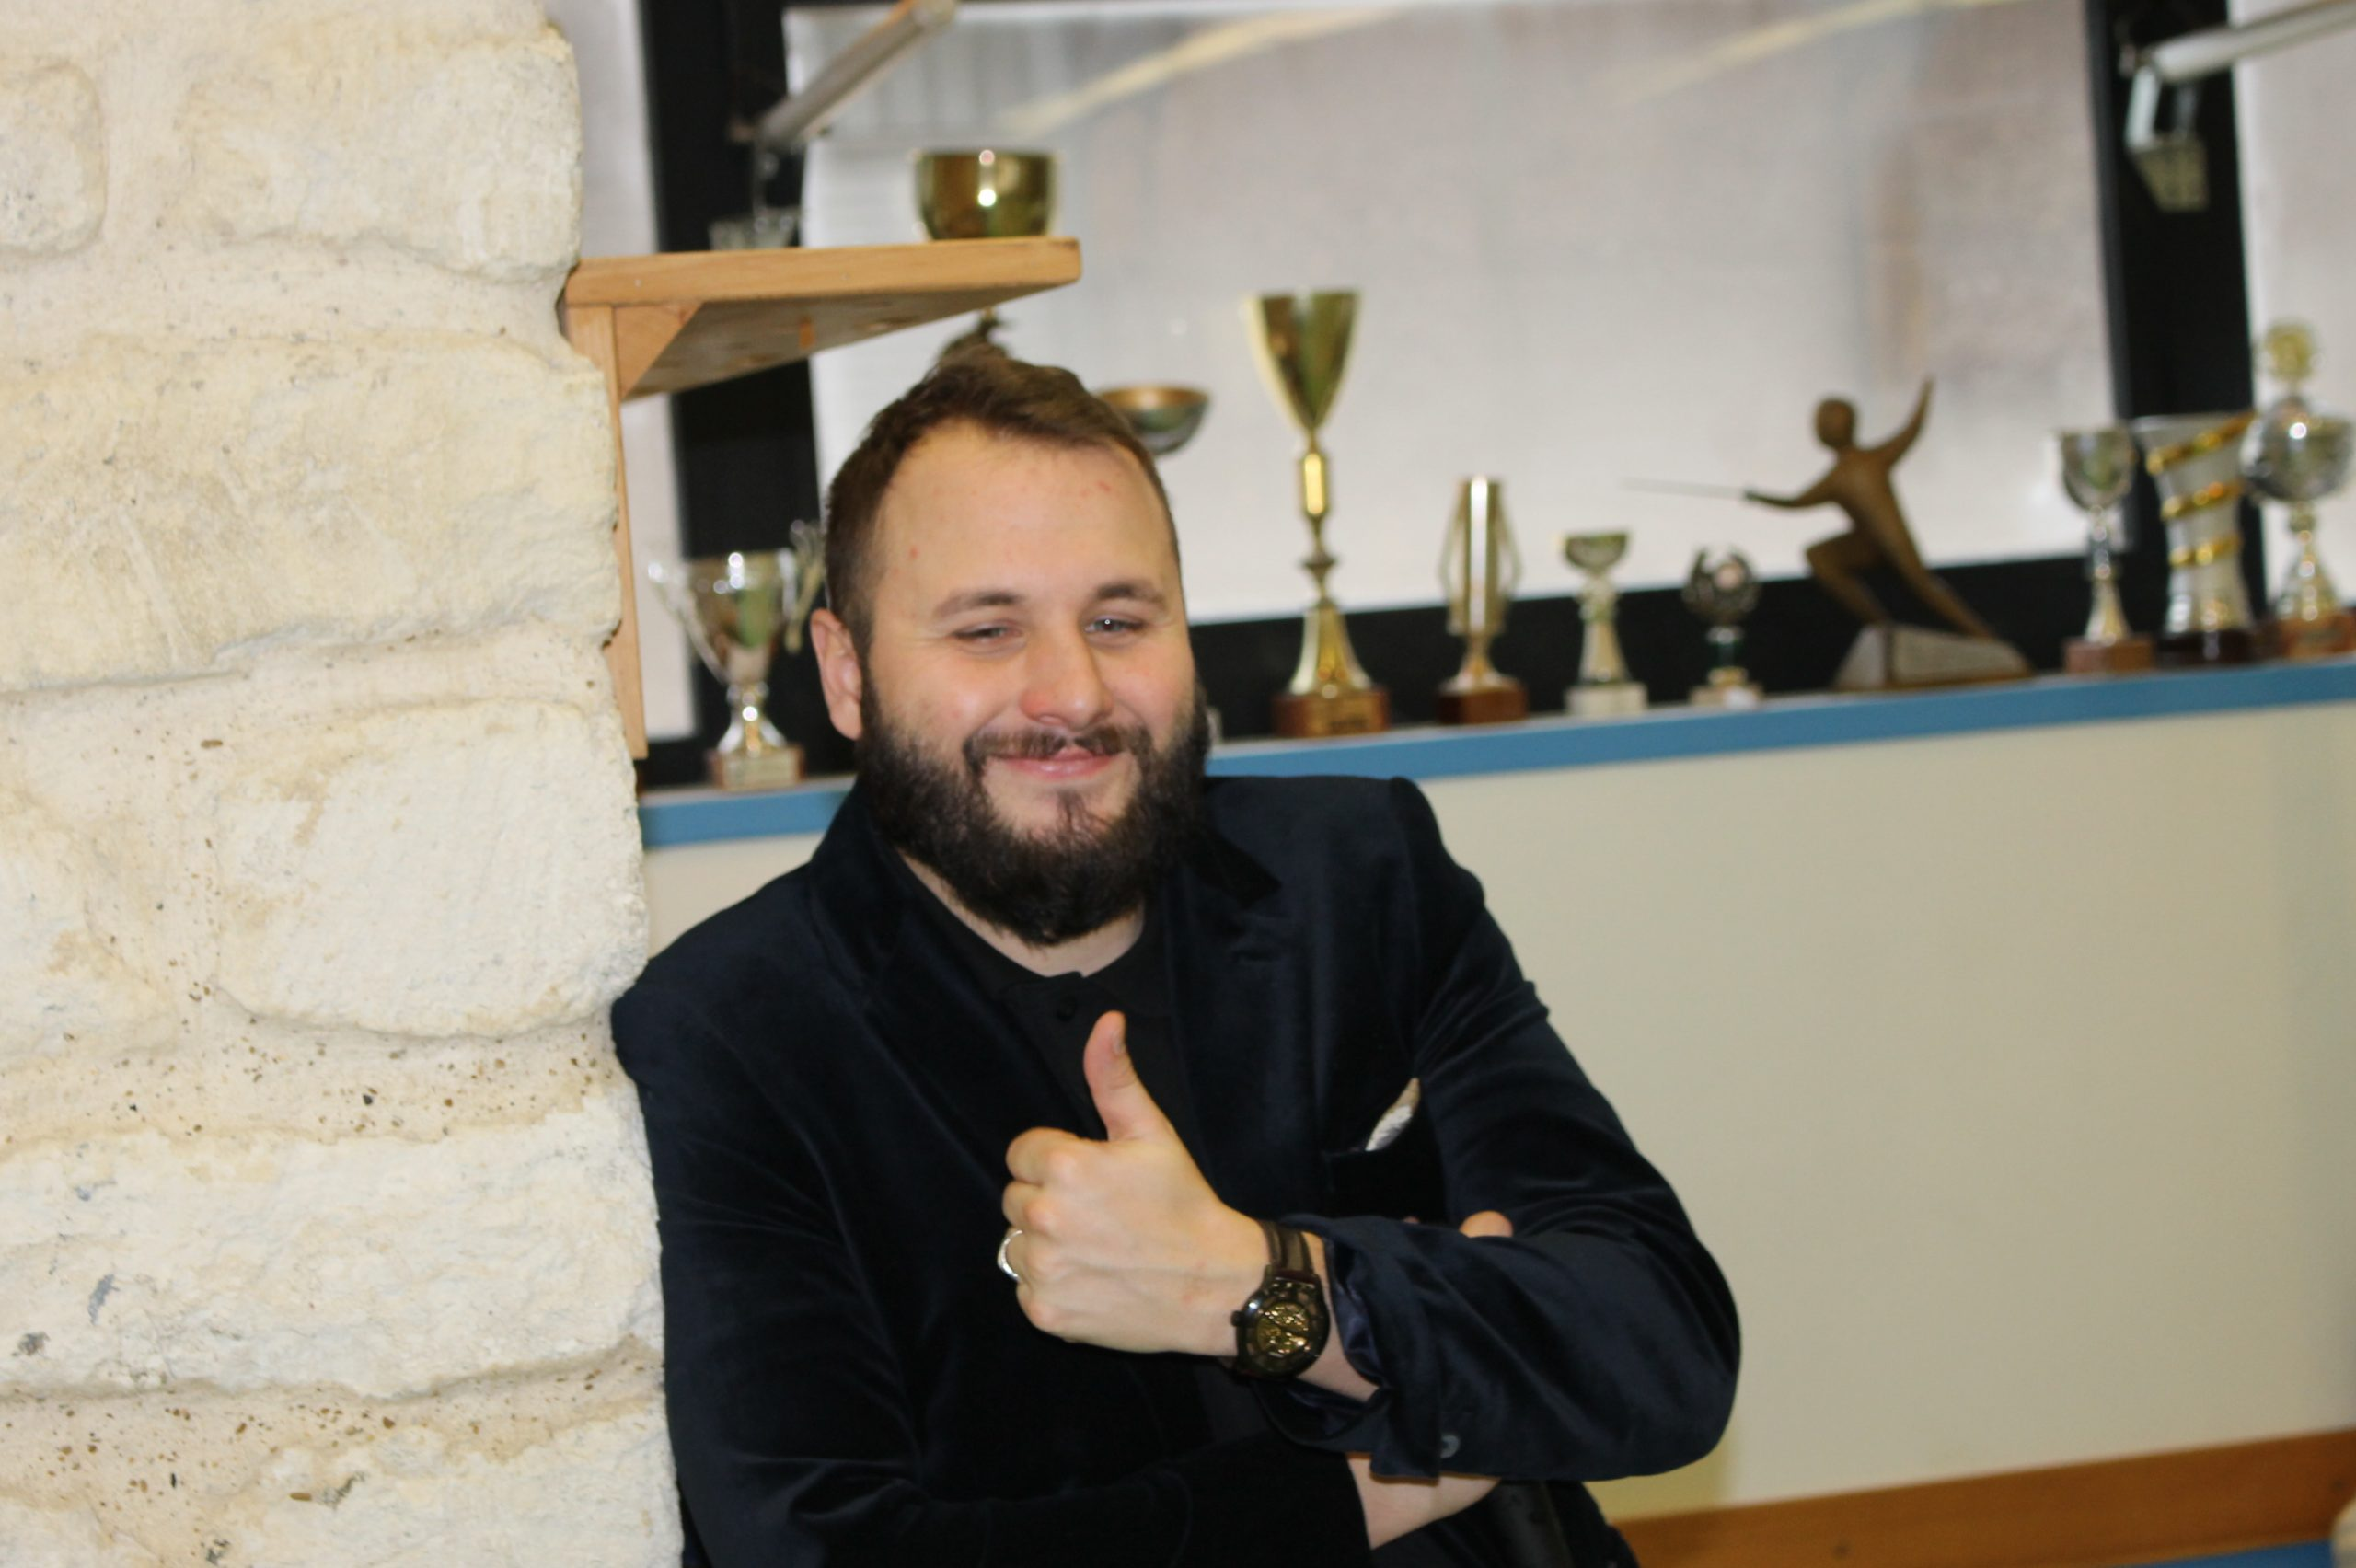 Maître POTDEVIN Rodolphe